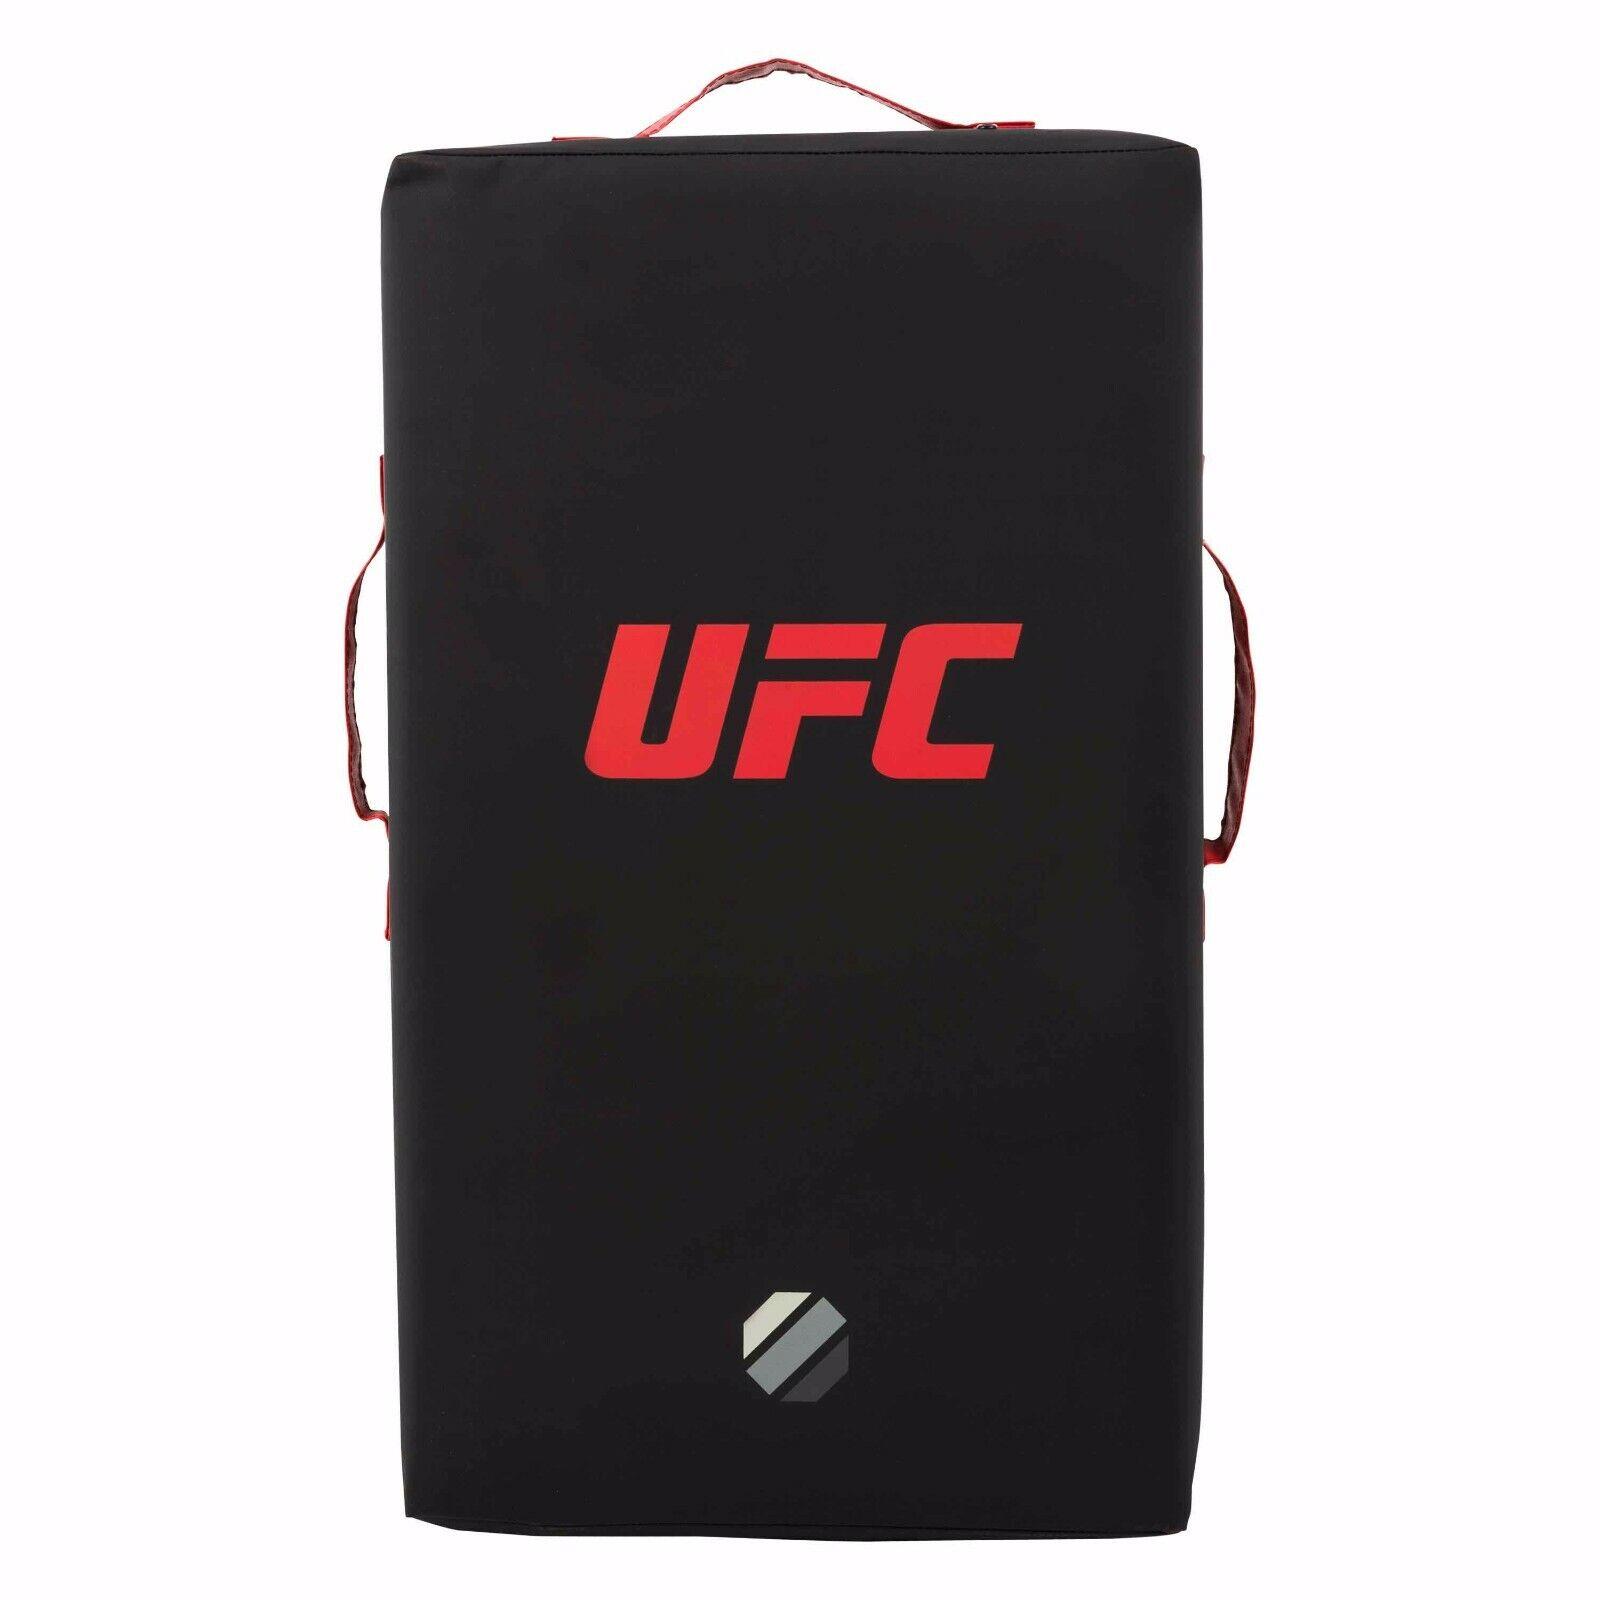 UFC Schlagkissen Taekwondo Taekwondo Taekwondo Muay Thai Kickboxen Kick Polster Mma Krav Maga 6f9fa9